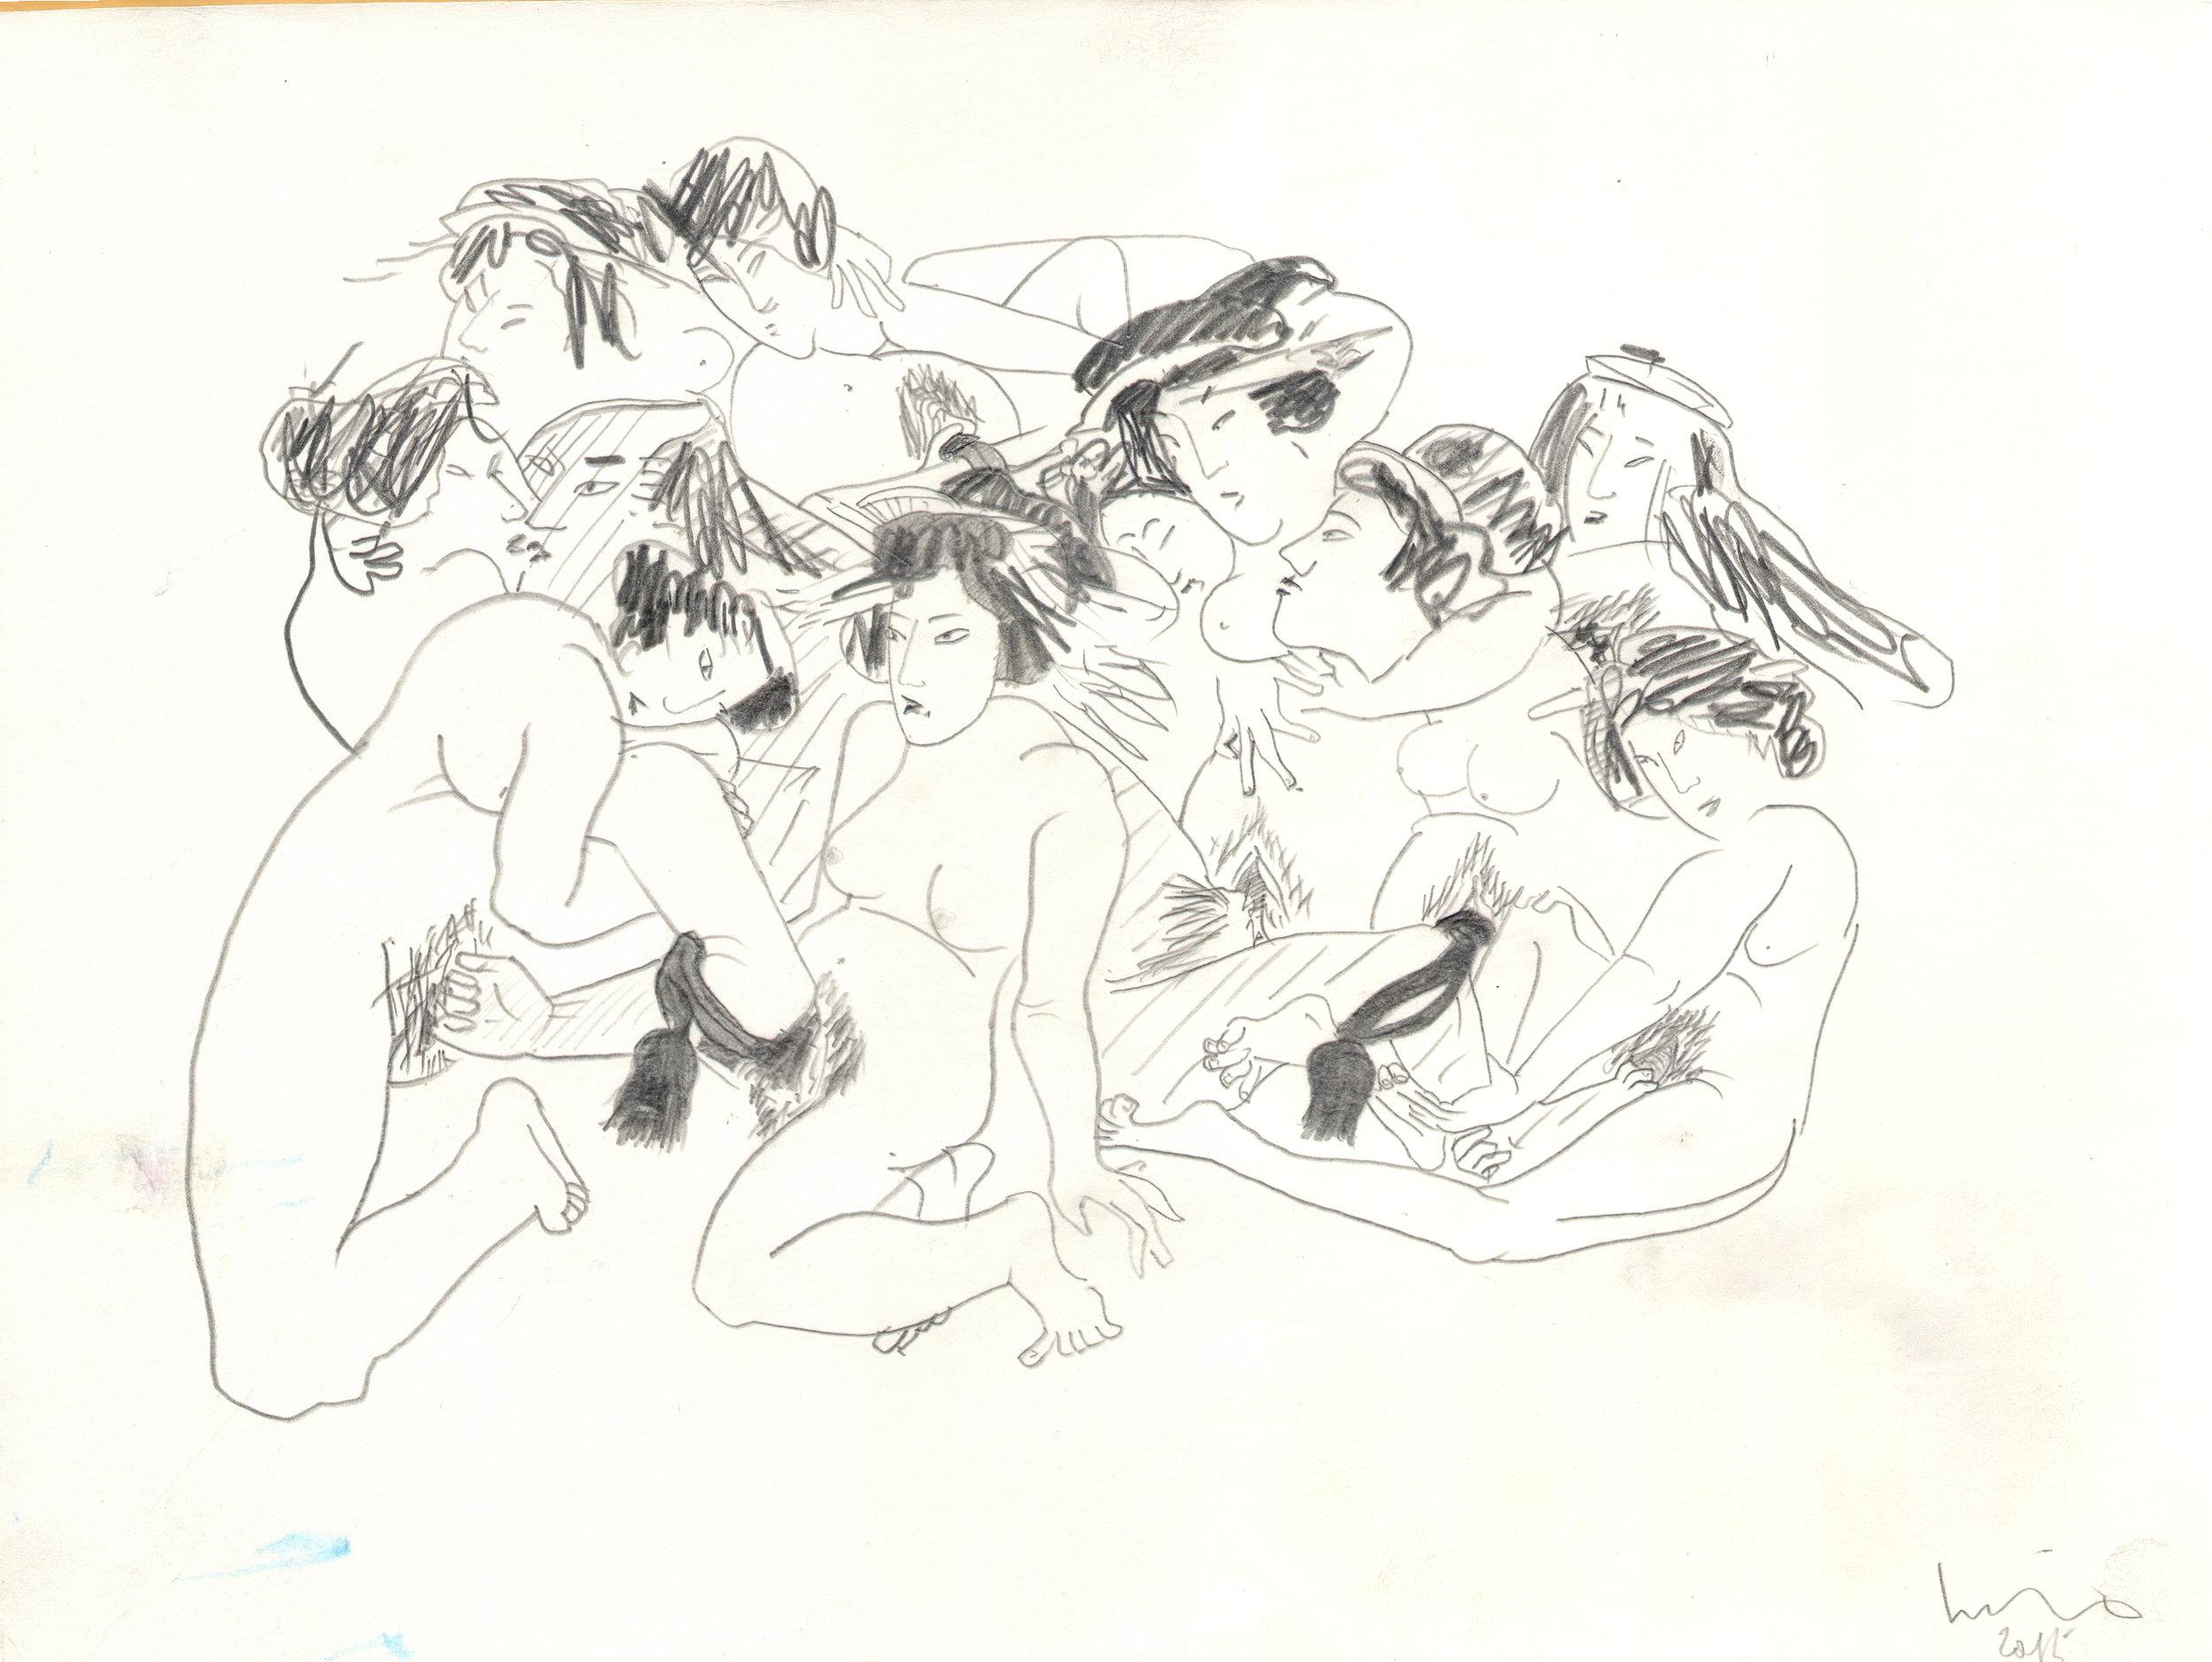 O.T. ( Serie Shunga III ), 2015  26x35.5cm, Bleistift auf Papier